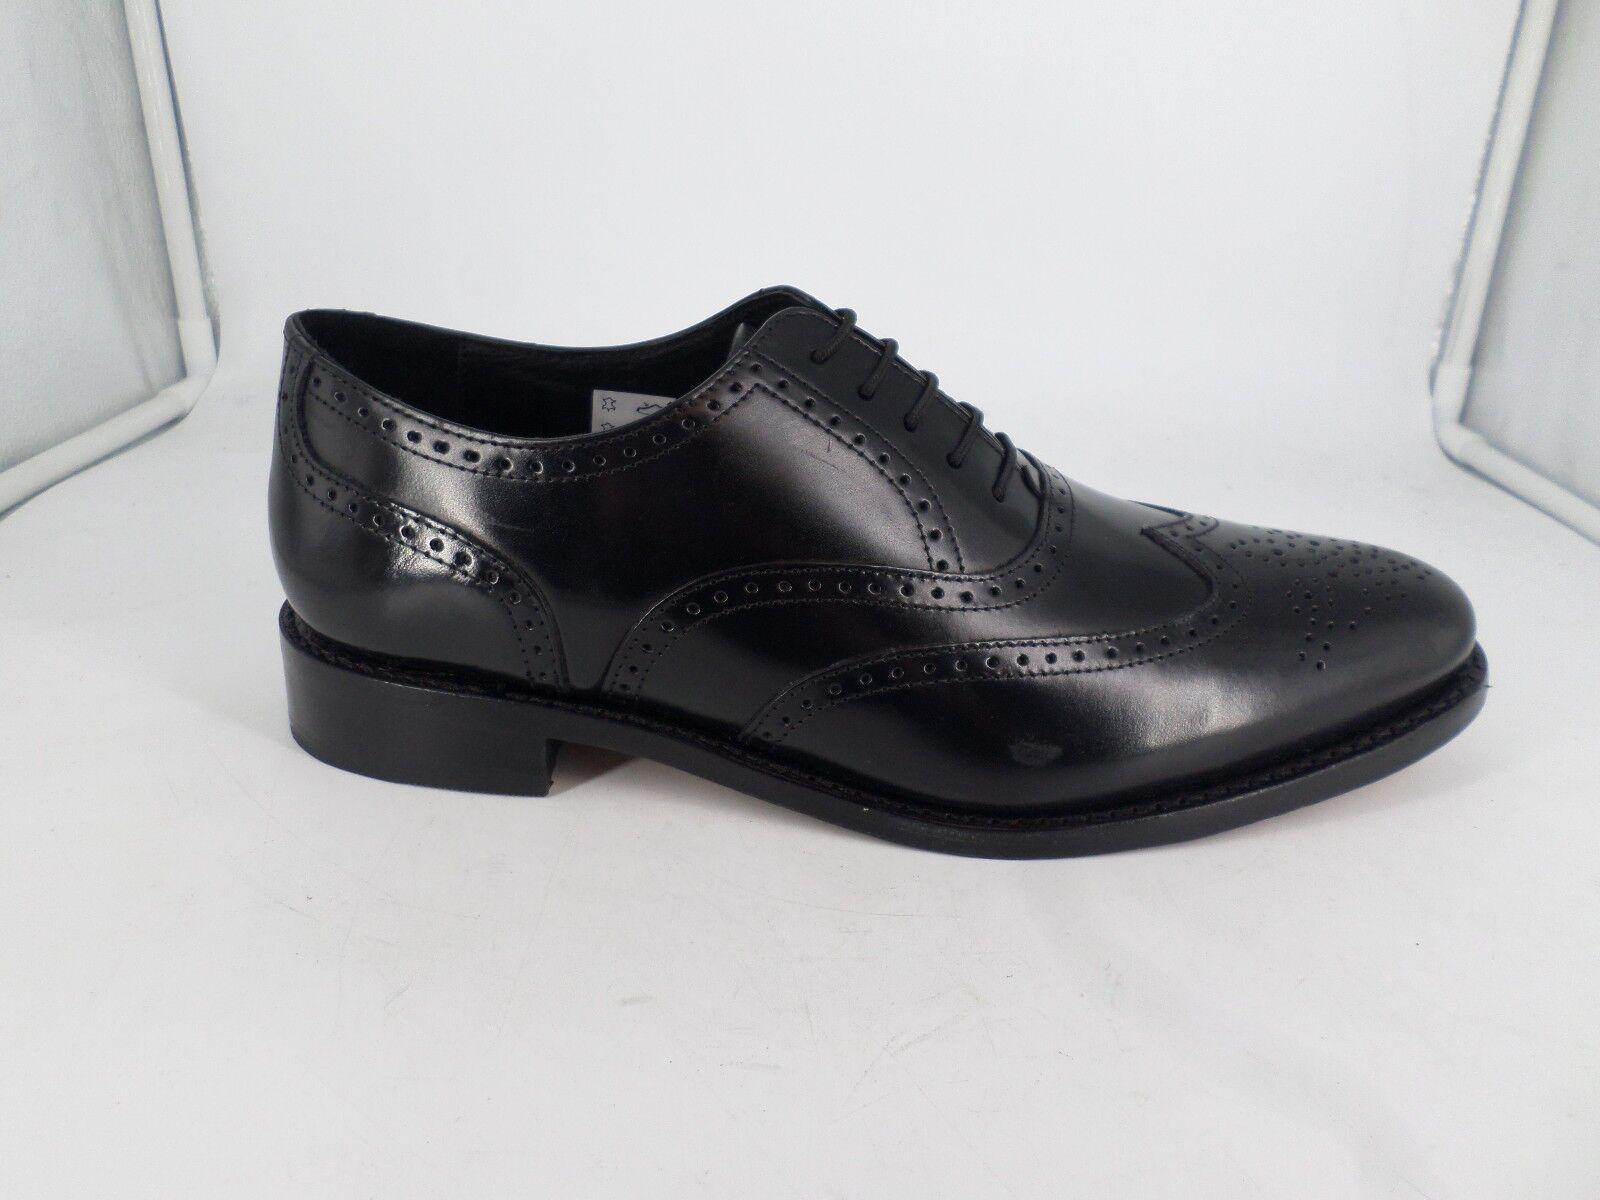 Samuel Windsor Classic Retro Cheltenham Brogues RRP  EU 44 NH01 31 Scarpe classiche da uomo